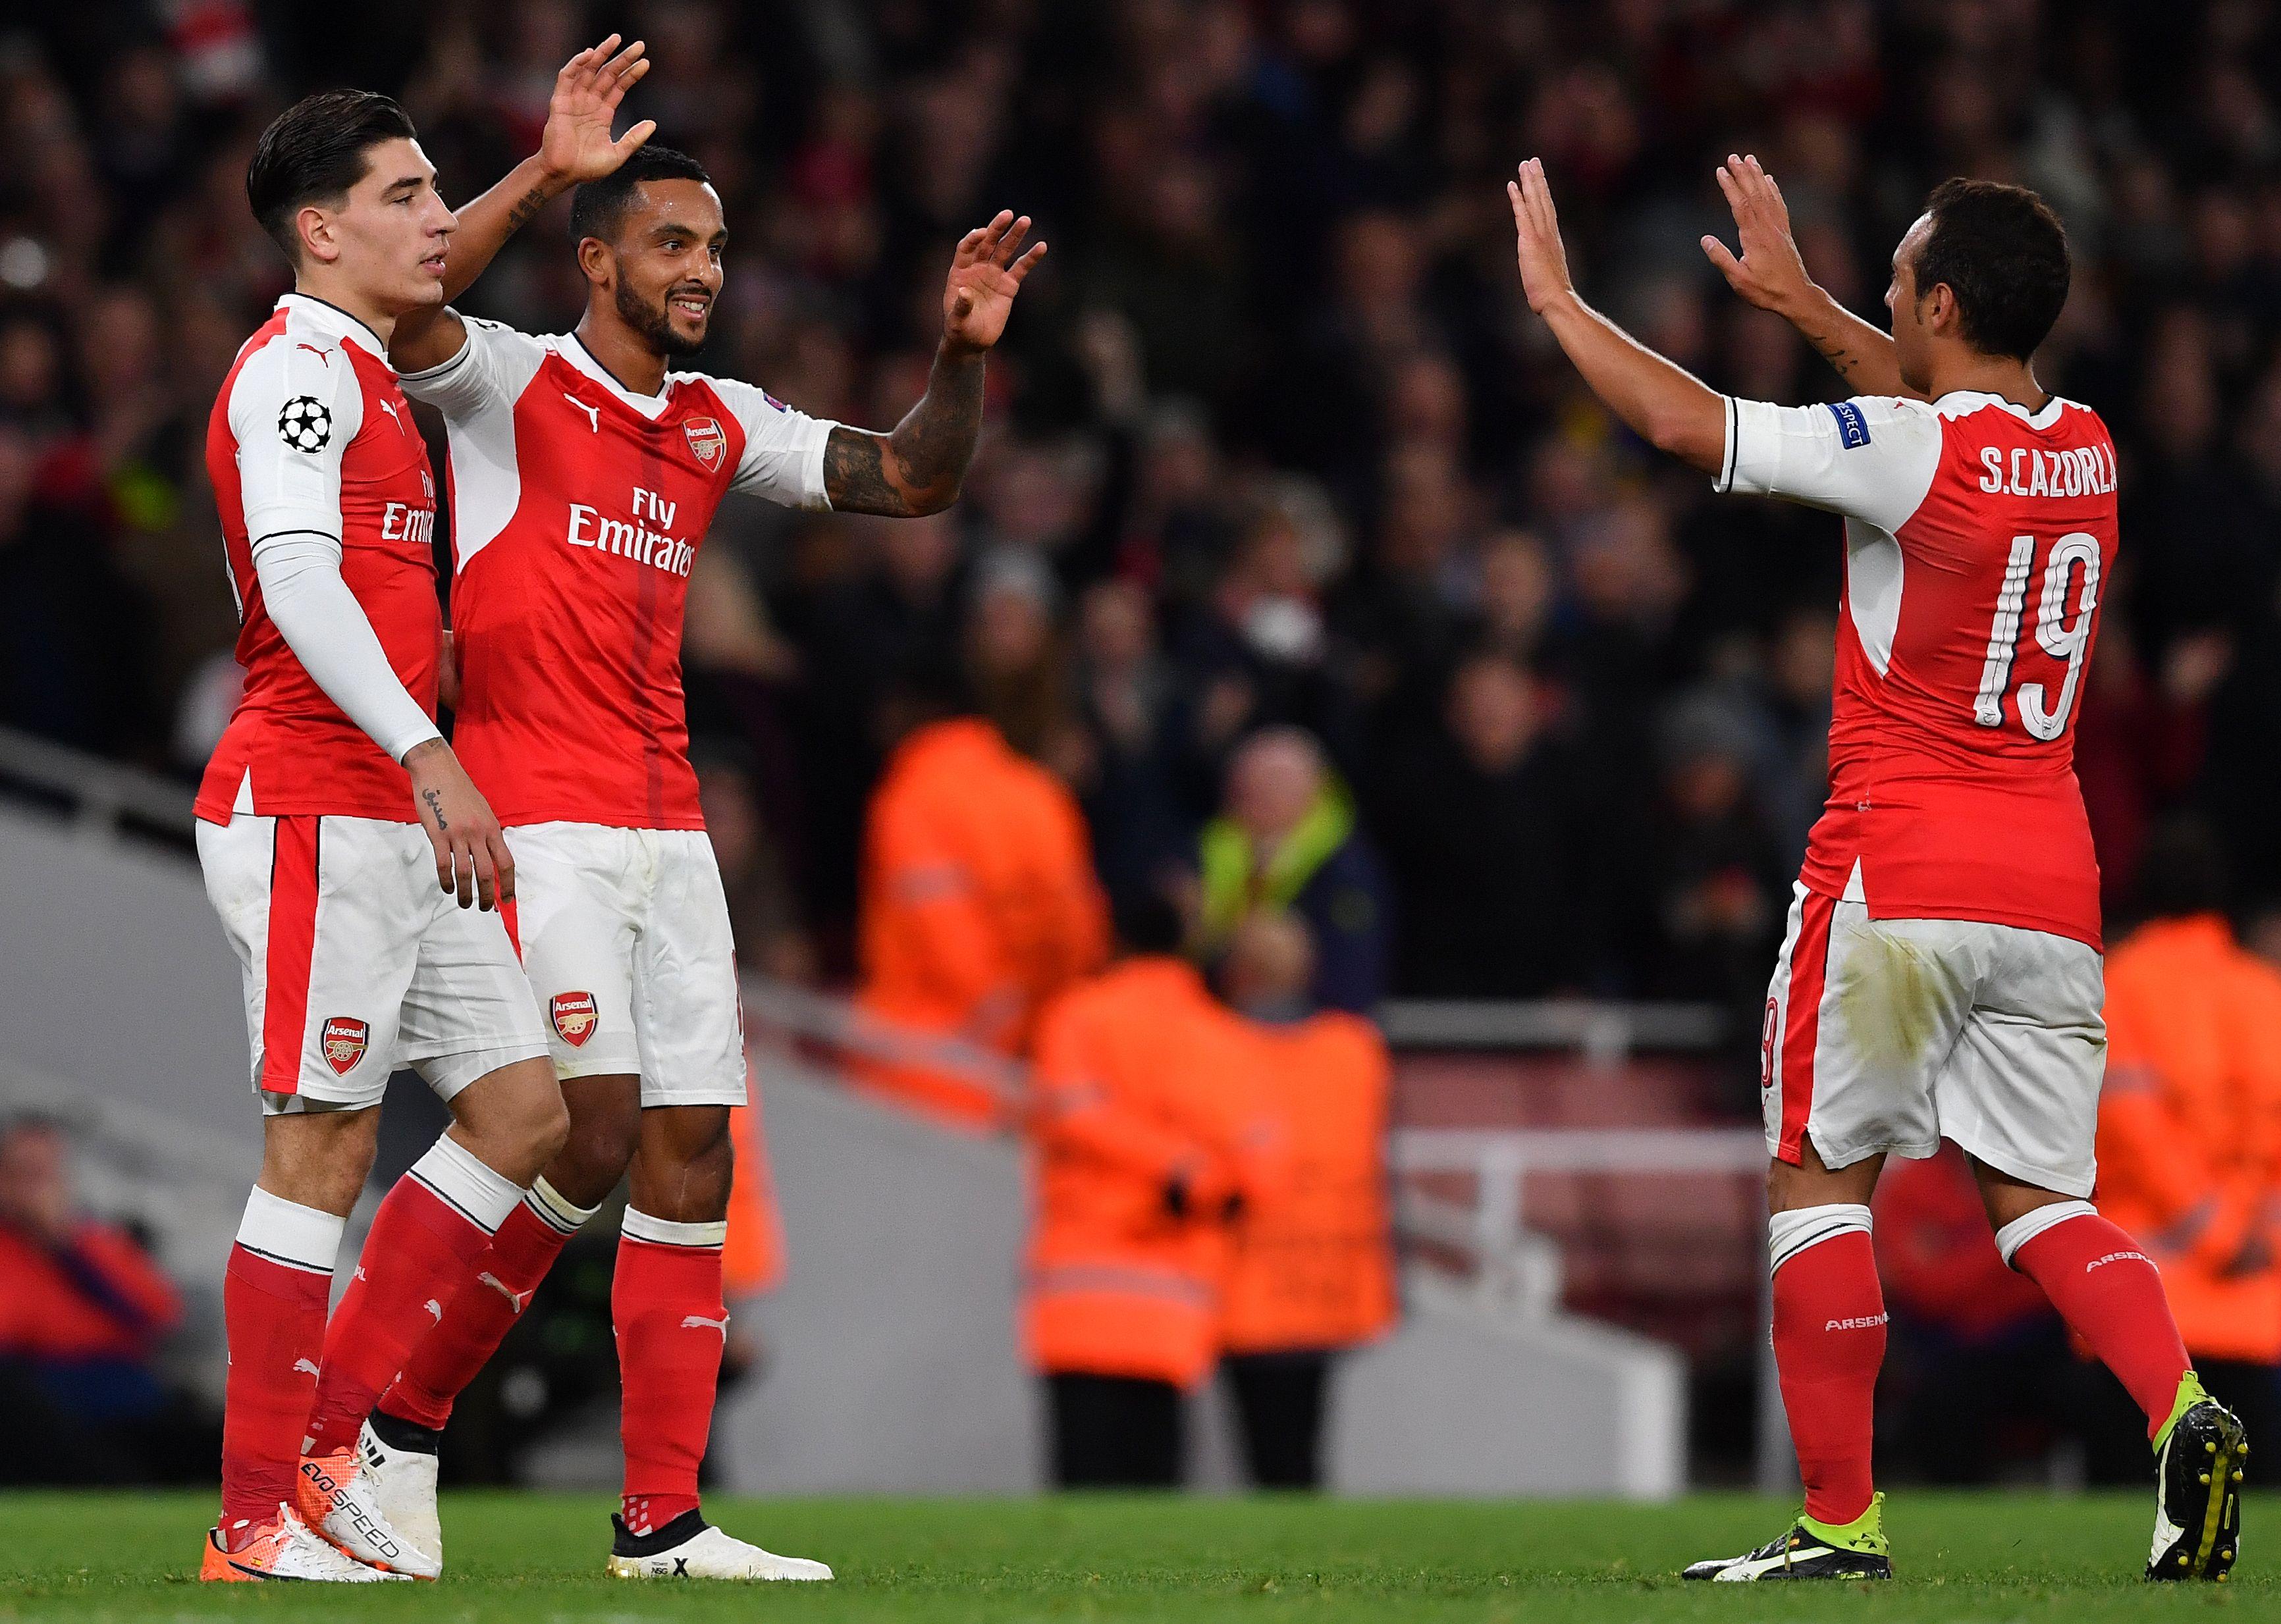 Theo Walcott, Santi Cazorla, Hector Bellerin and Nacho Monreal to return for Arsenal v Tottenham